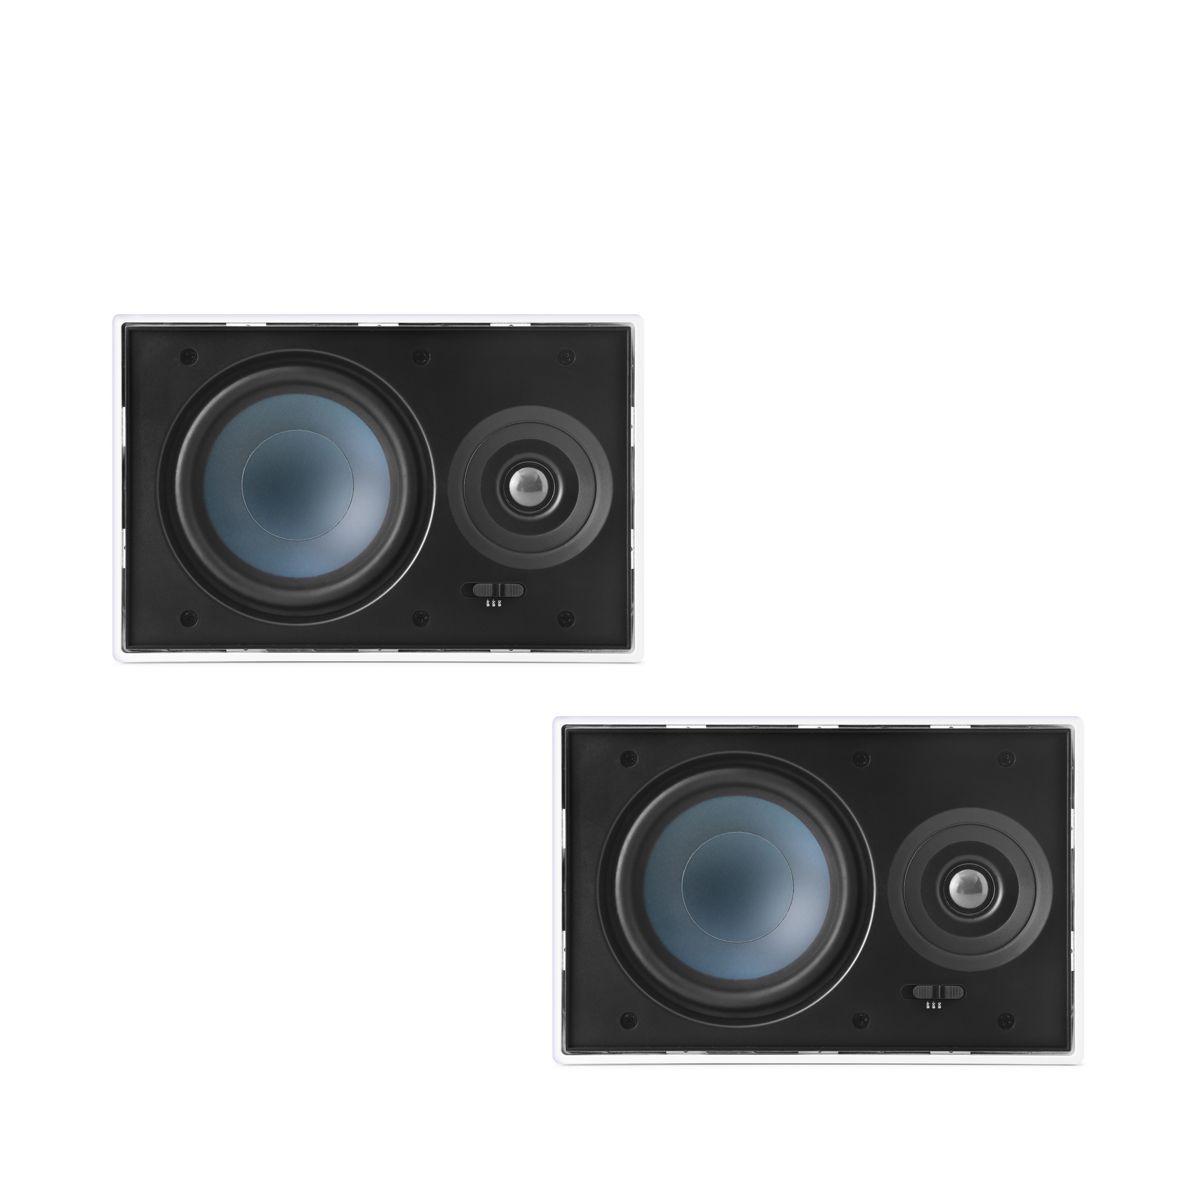 Kit 5.1.2 Dolby Atmos Caixa Acústica de Embutir LCR-A100 + LR-E100 + NQ6-M100 + Subwoofer Compact Cube 8 AAT